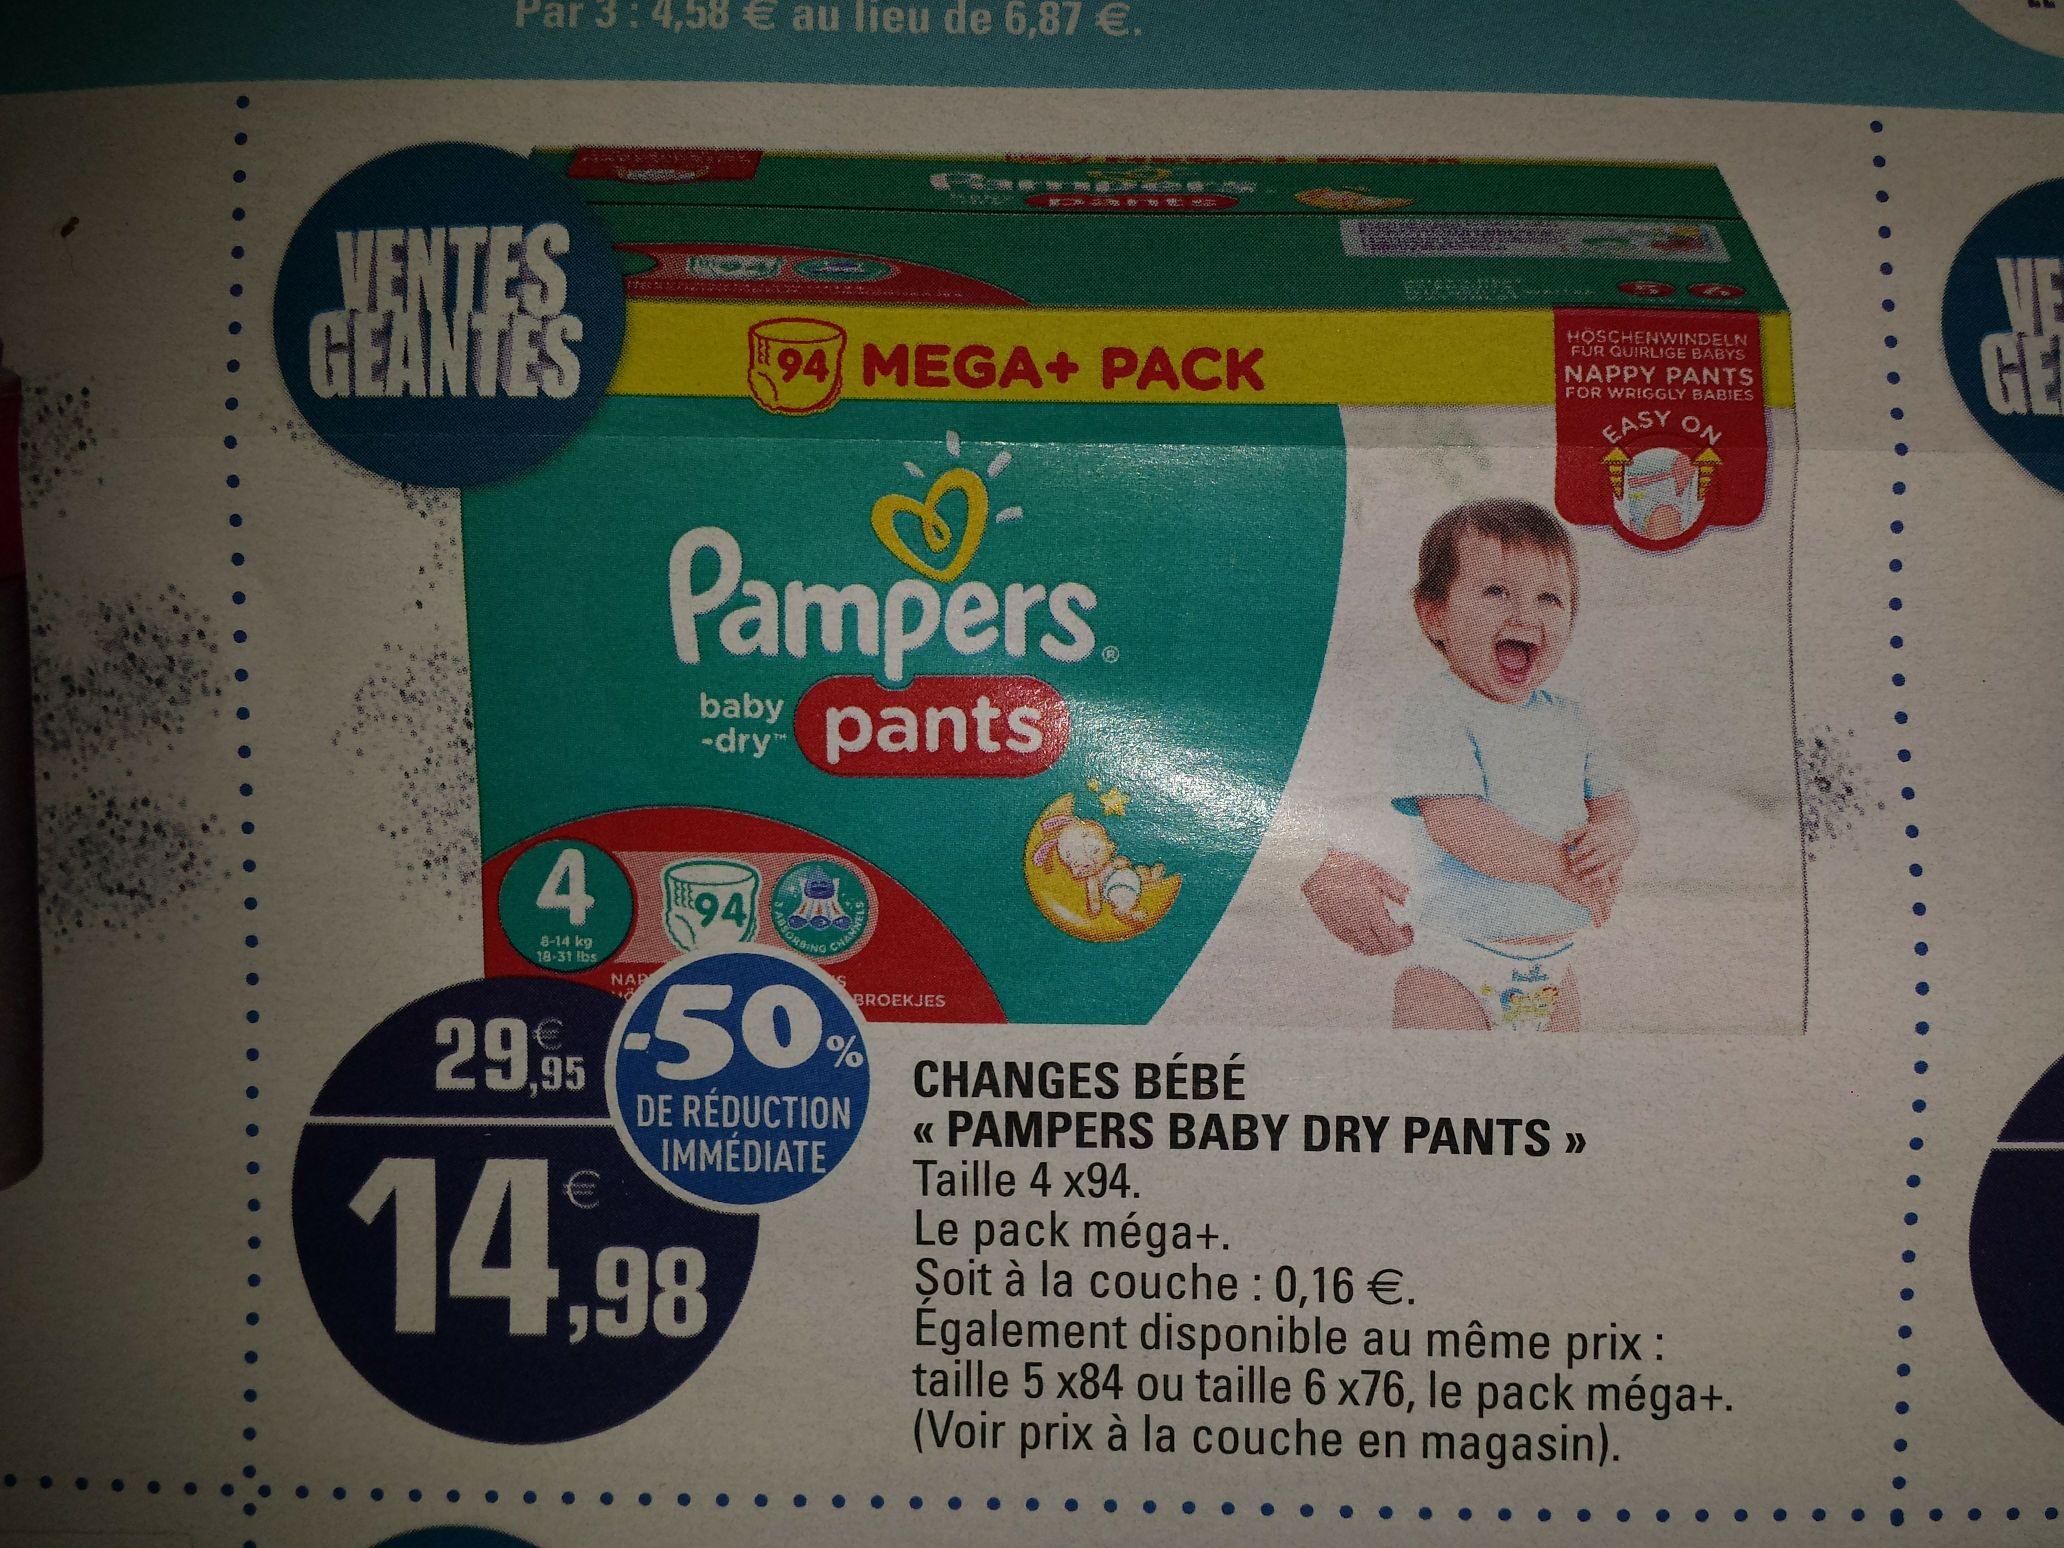 Mega pack de couches culottes pampers baby dry pants tailles au choix via bdr - Prix couches pampers leclerc ...